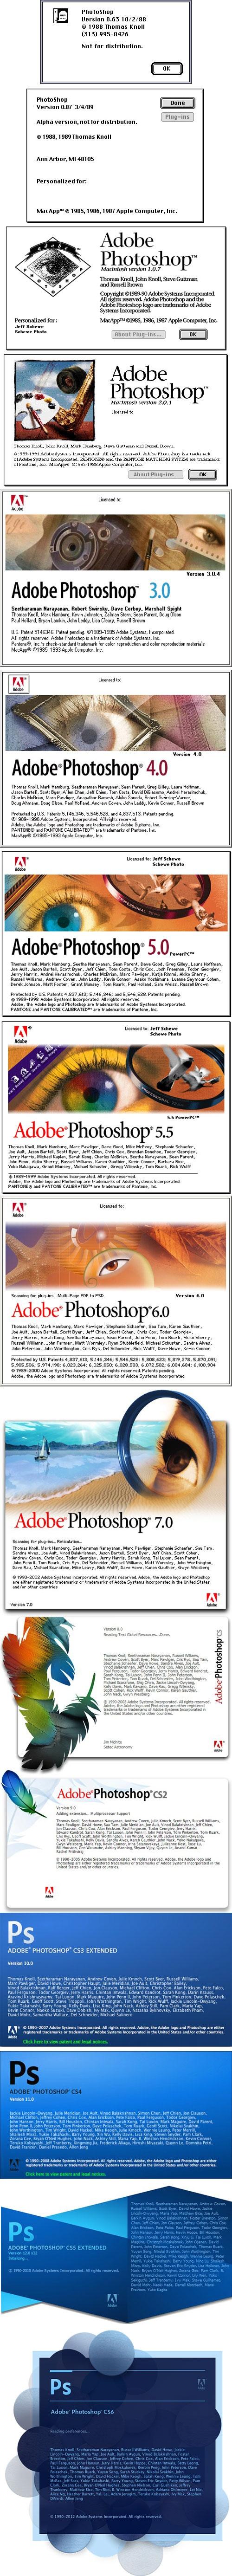 24 years of Photoshop splash screens